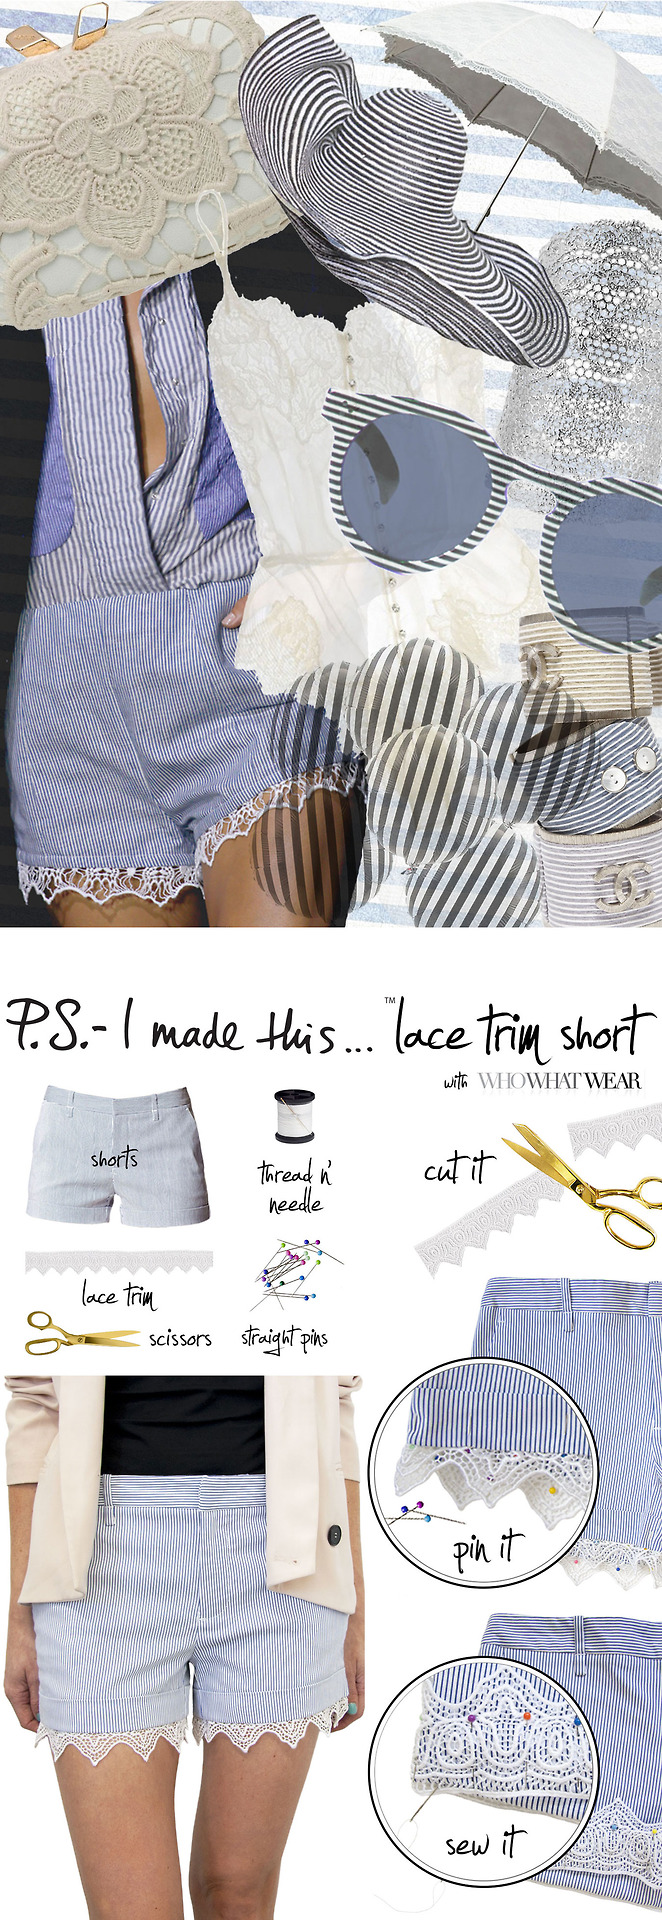 lace_trim_shorts-tumblr_MERGED